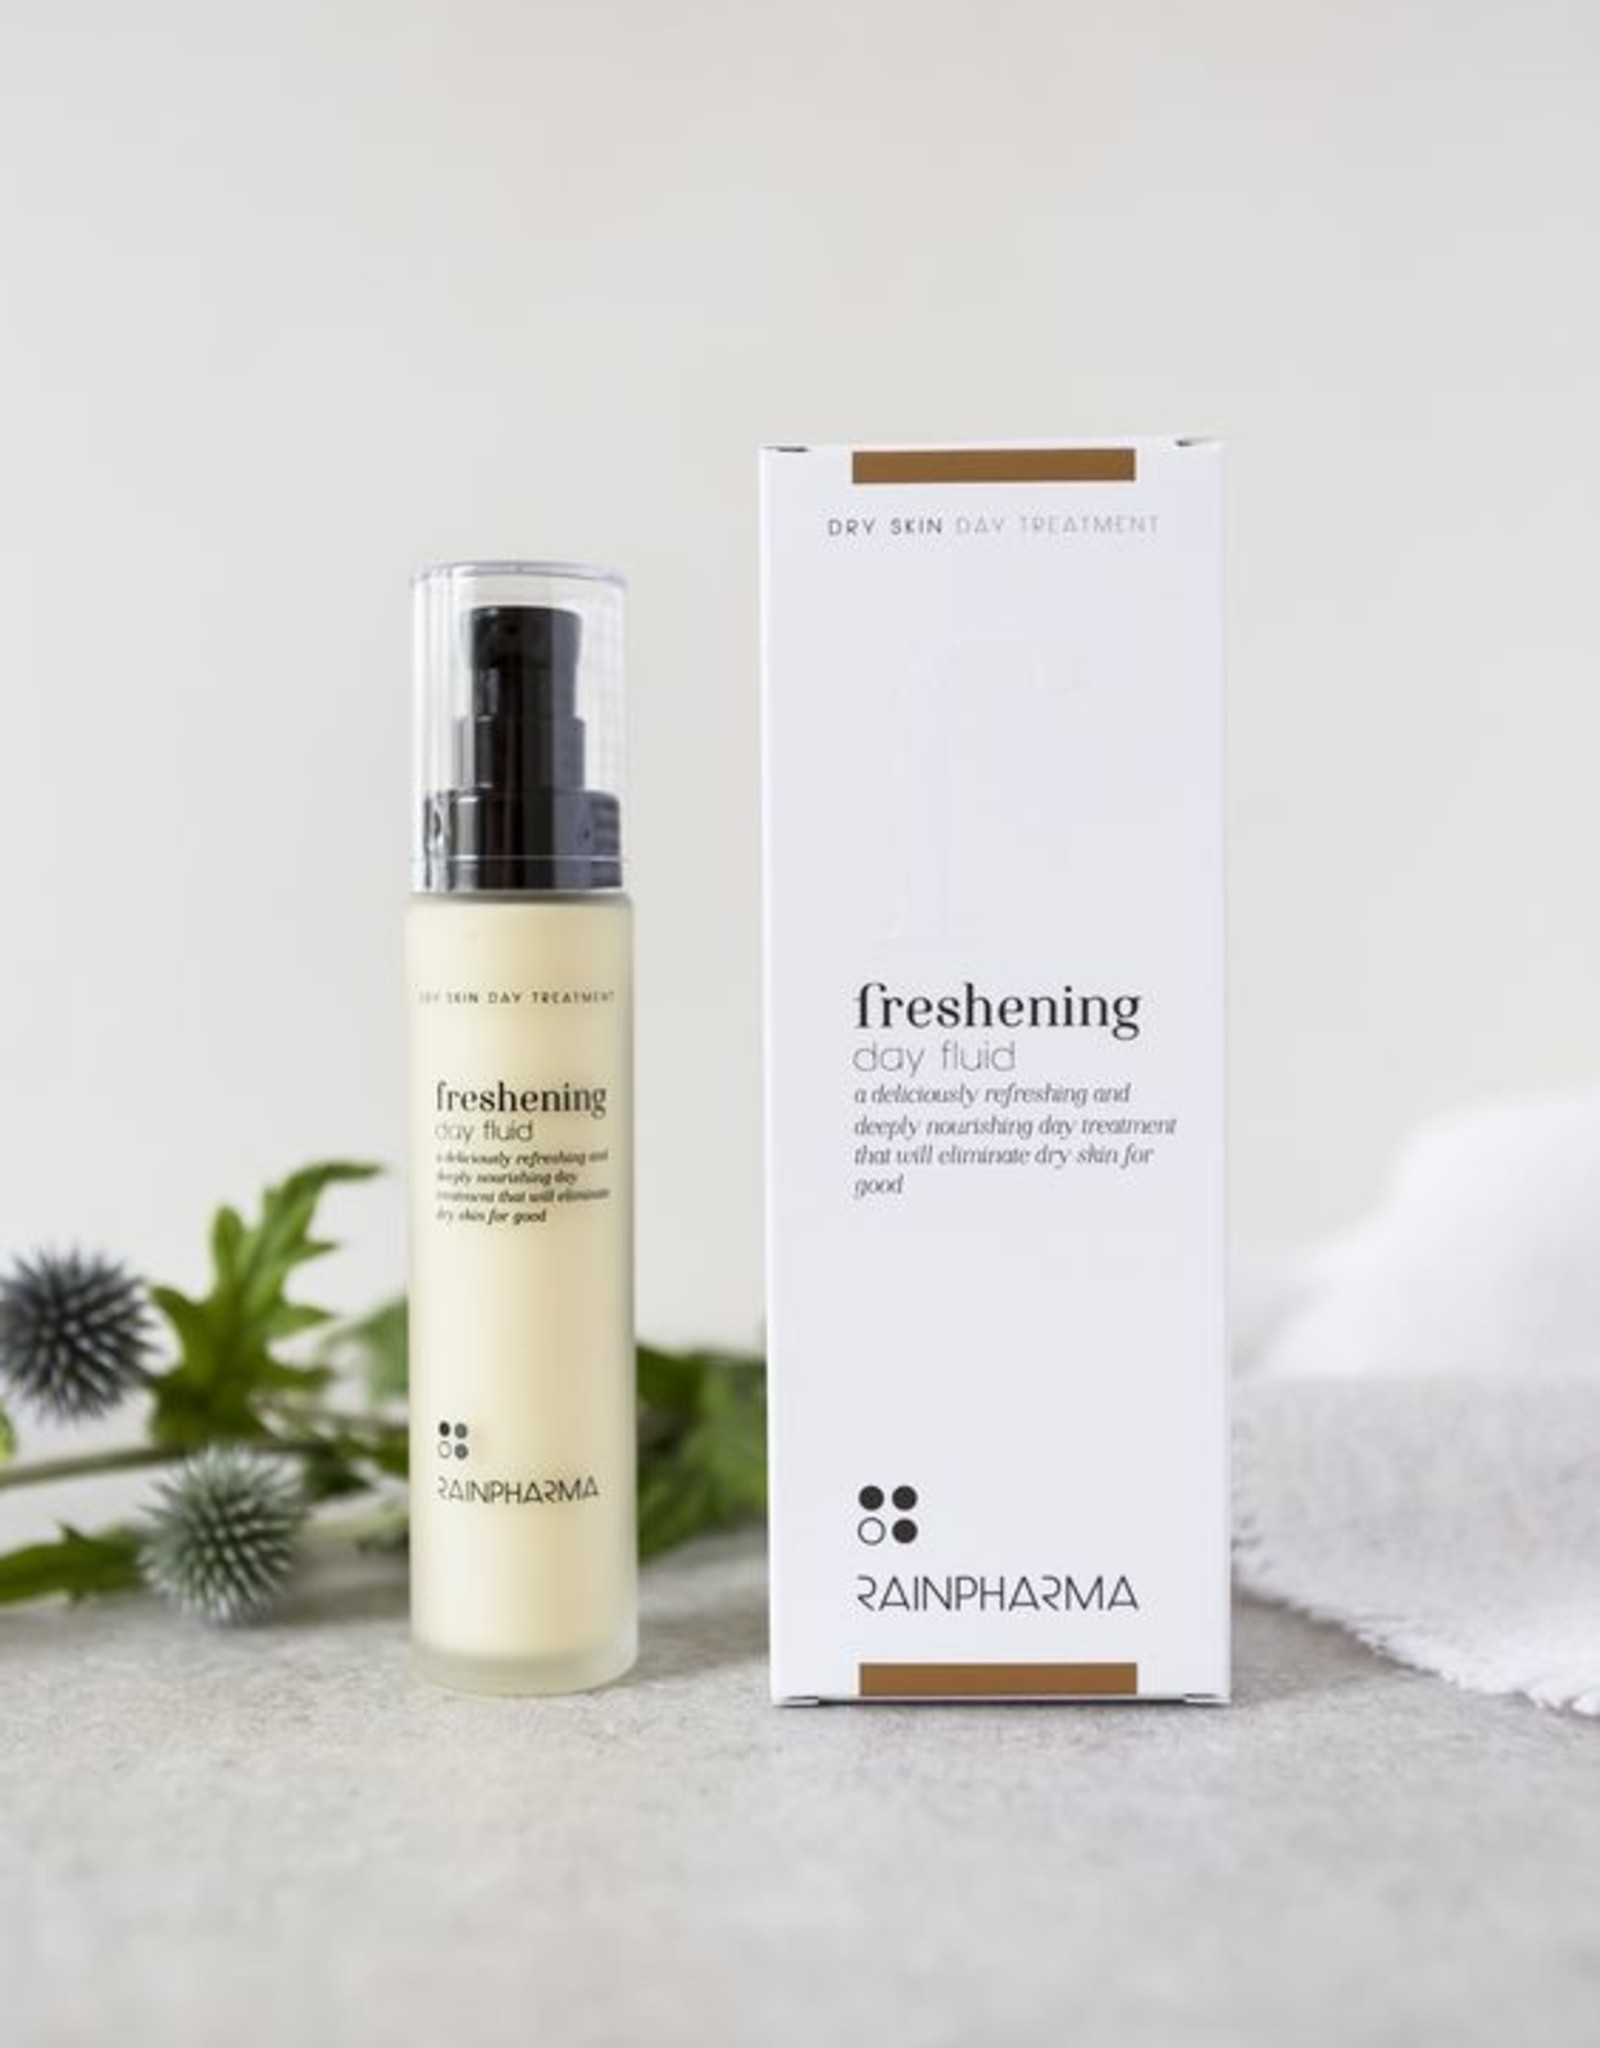 RainPharma Freshening Day Fluid 50ml - Rainpharma